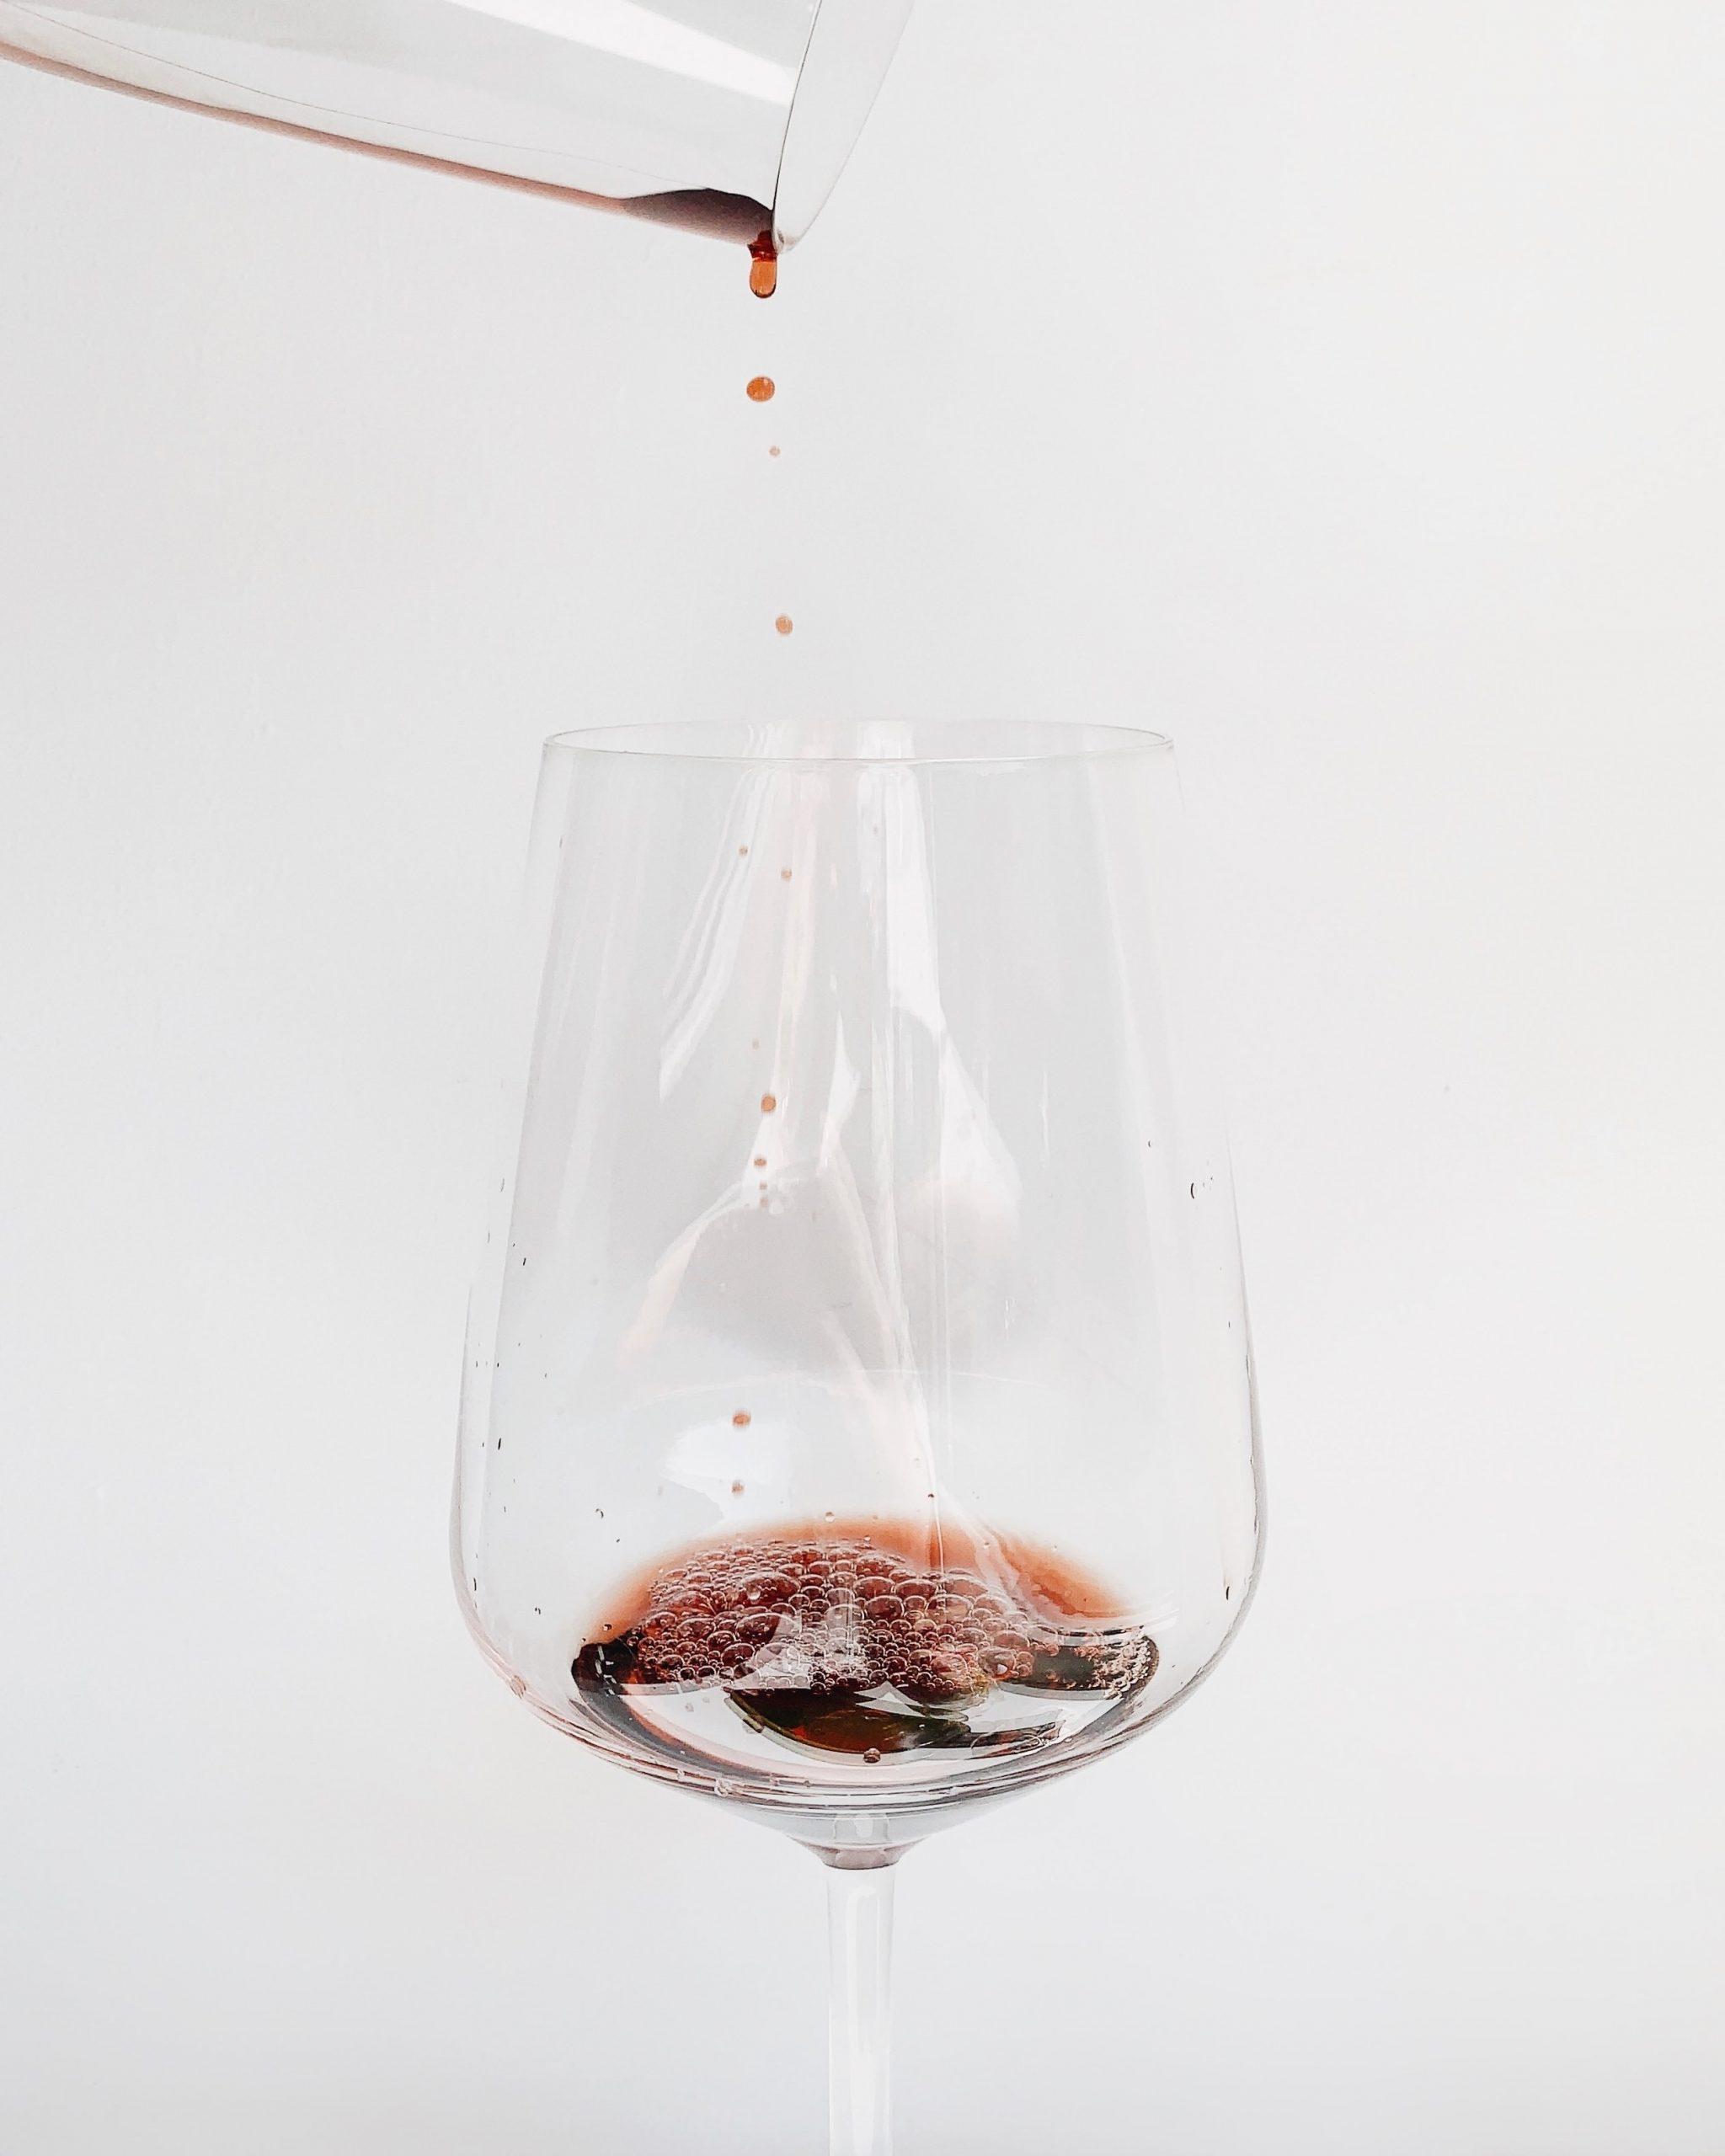 Una copa de vino / Foto: Unplash